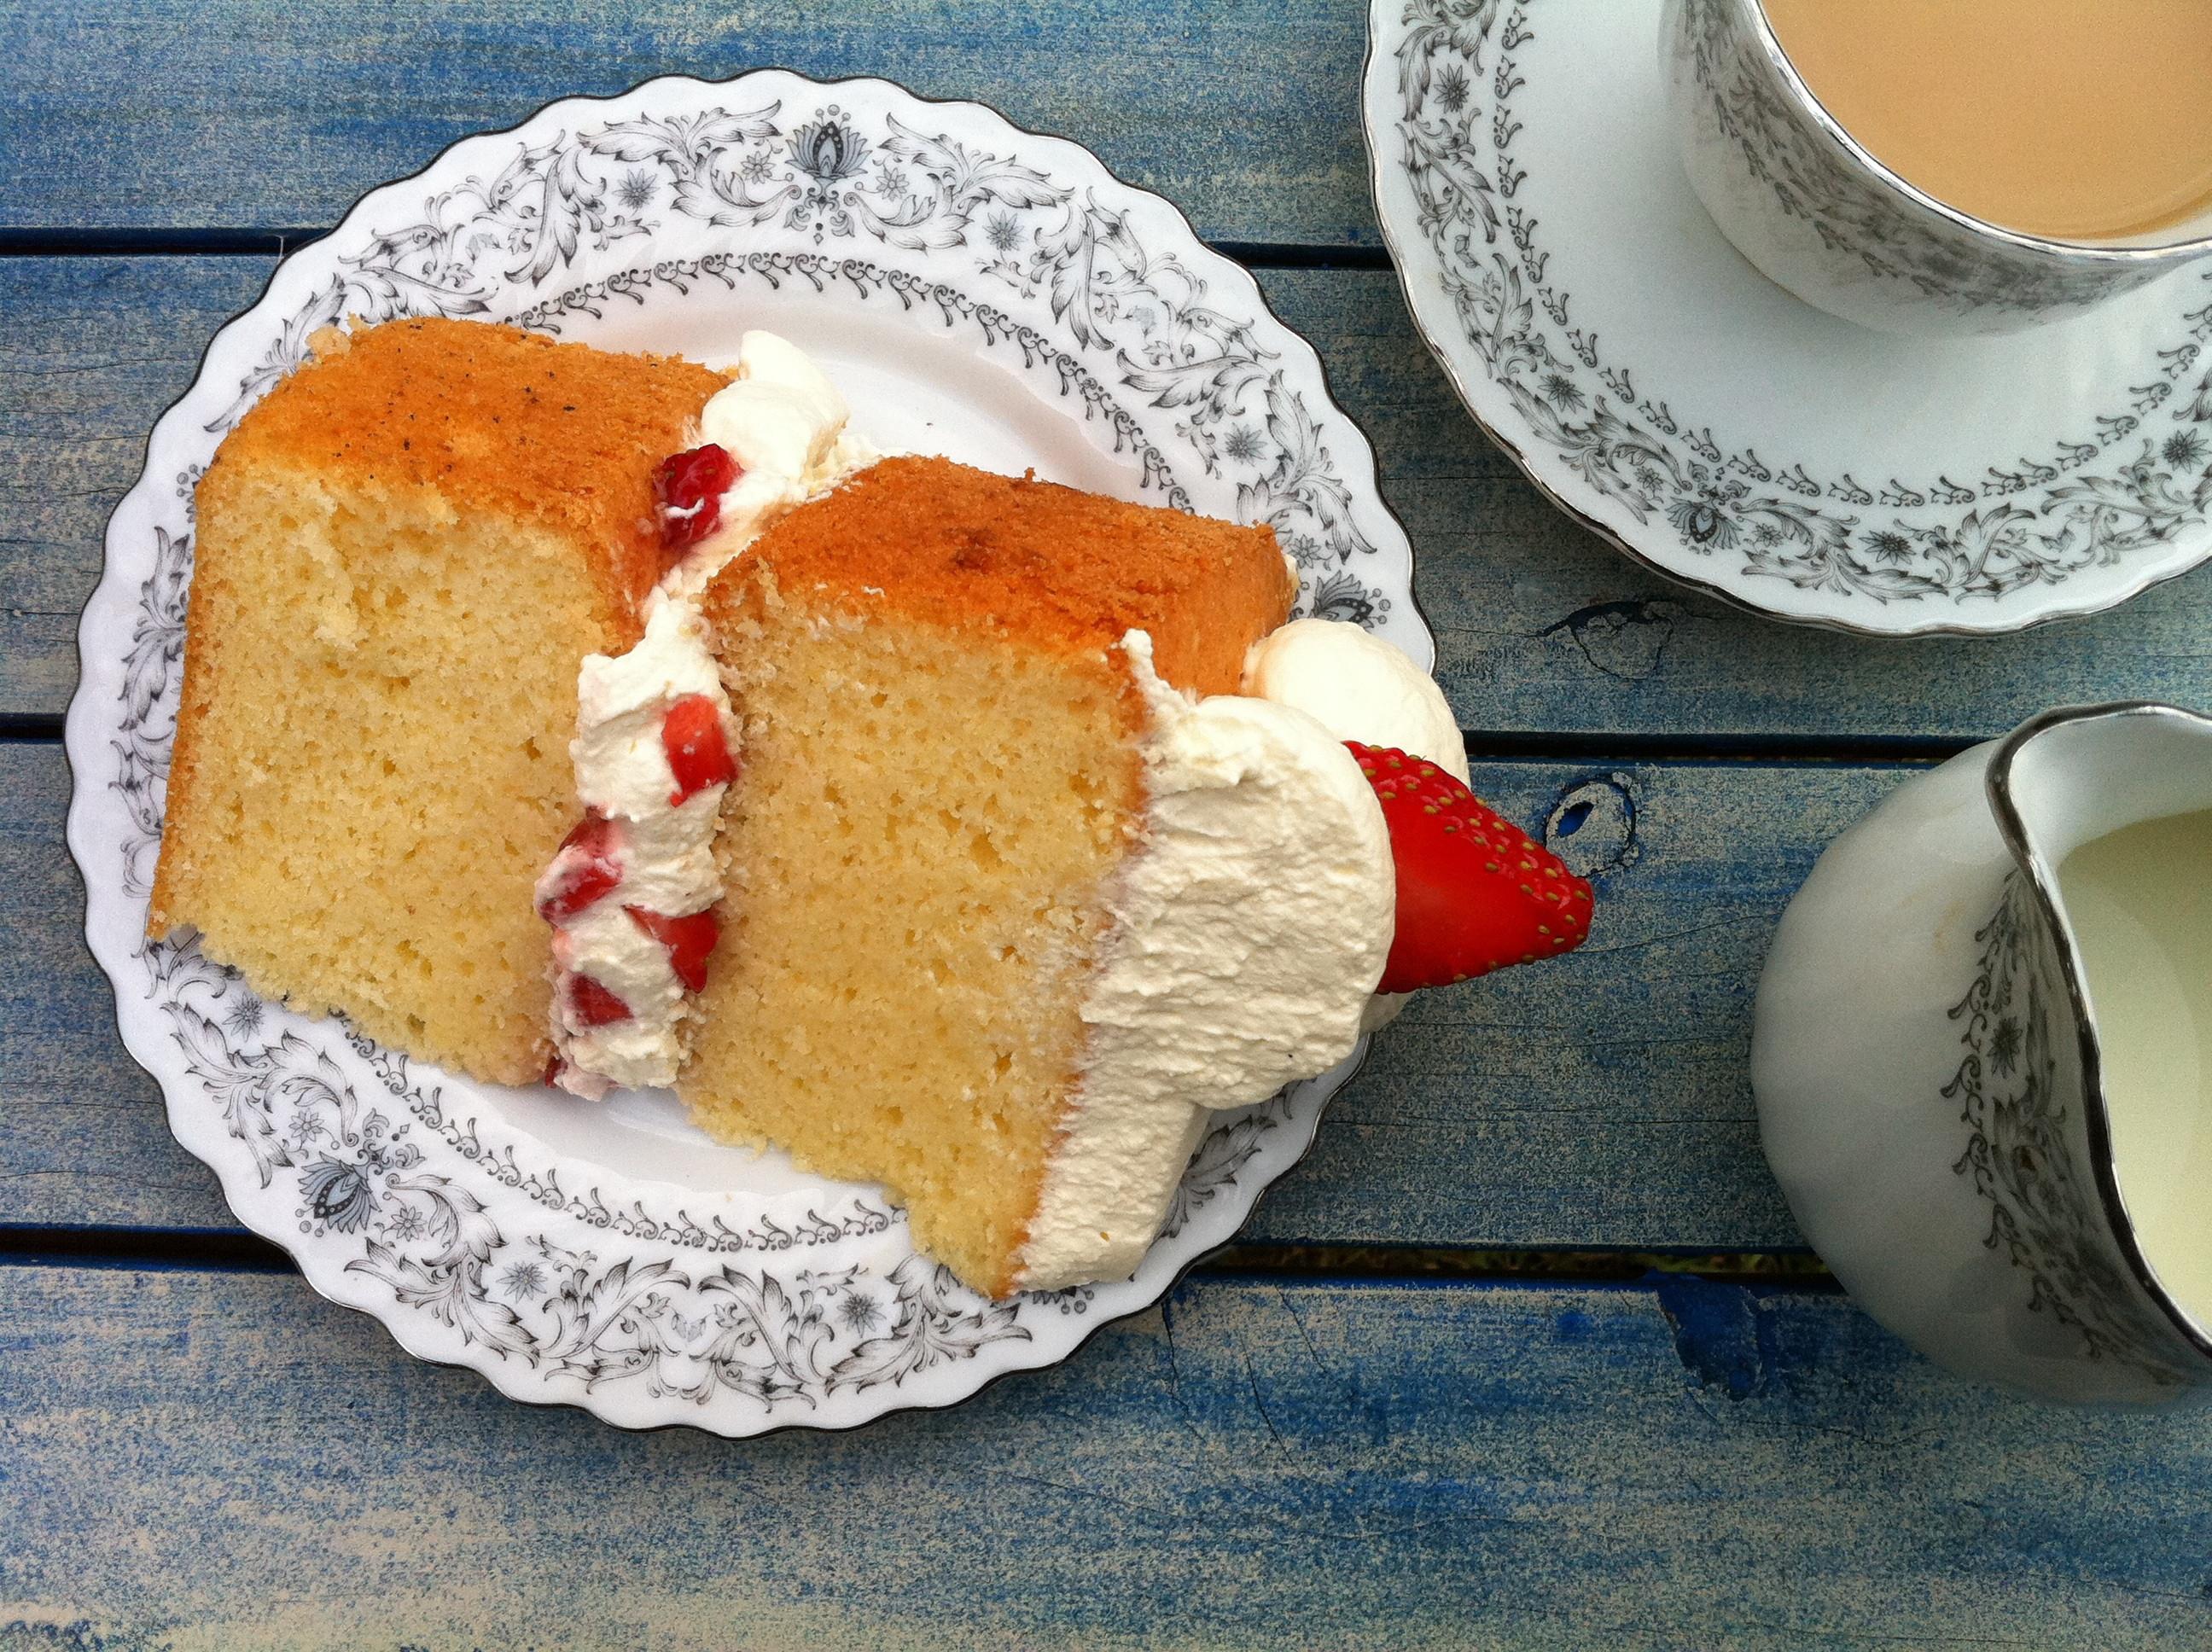 Sponge Cake Recipe  HowToCookThat Cakes Dessert & Chocolate